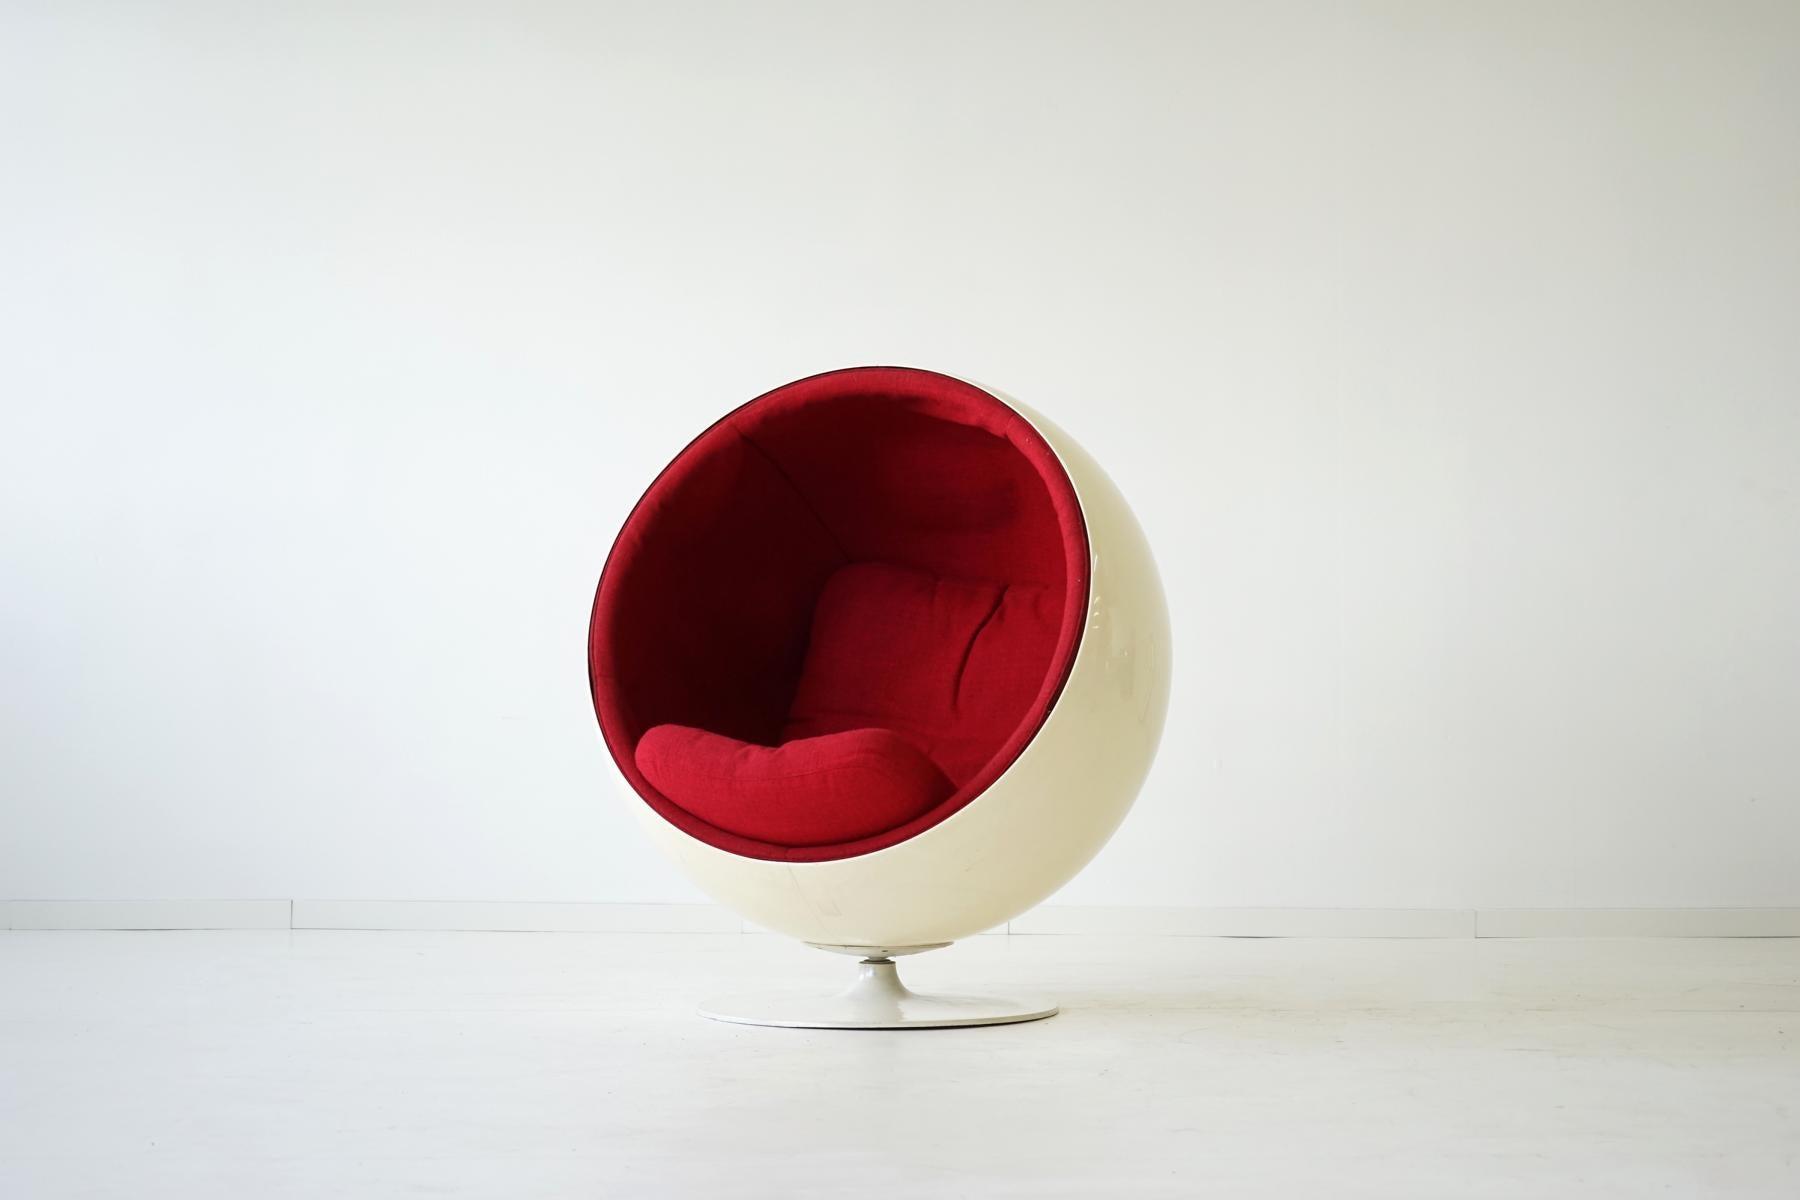 Tremendous Original Ball Chair By Eero Aarnio Asko Bei 1Stdibs Pdpeps Interior Chair Design Pdpepsorg